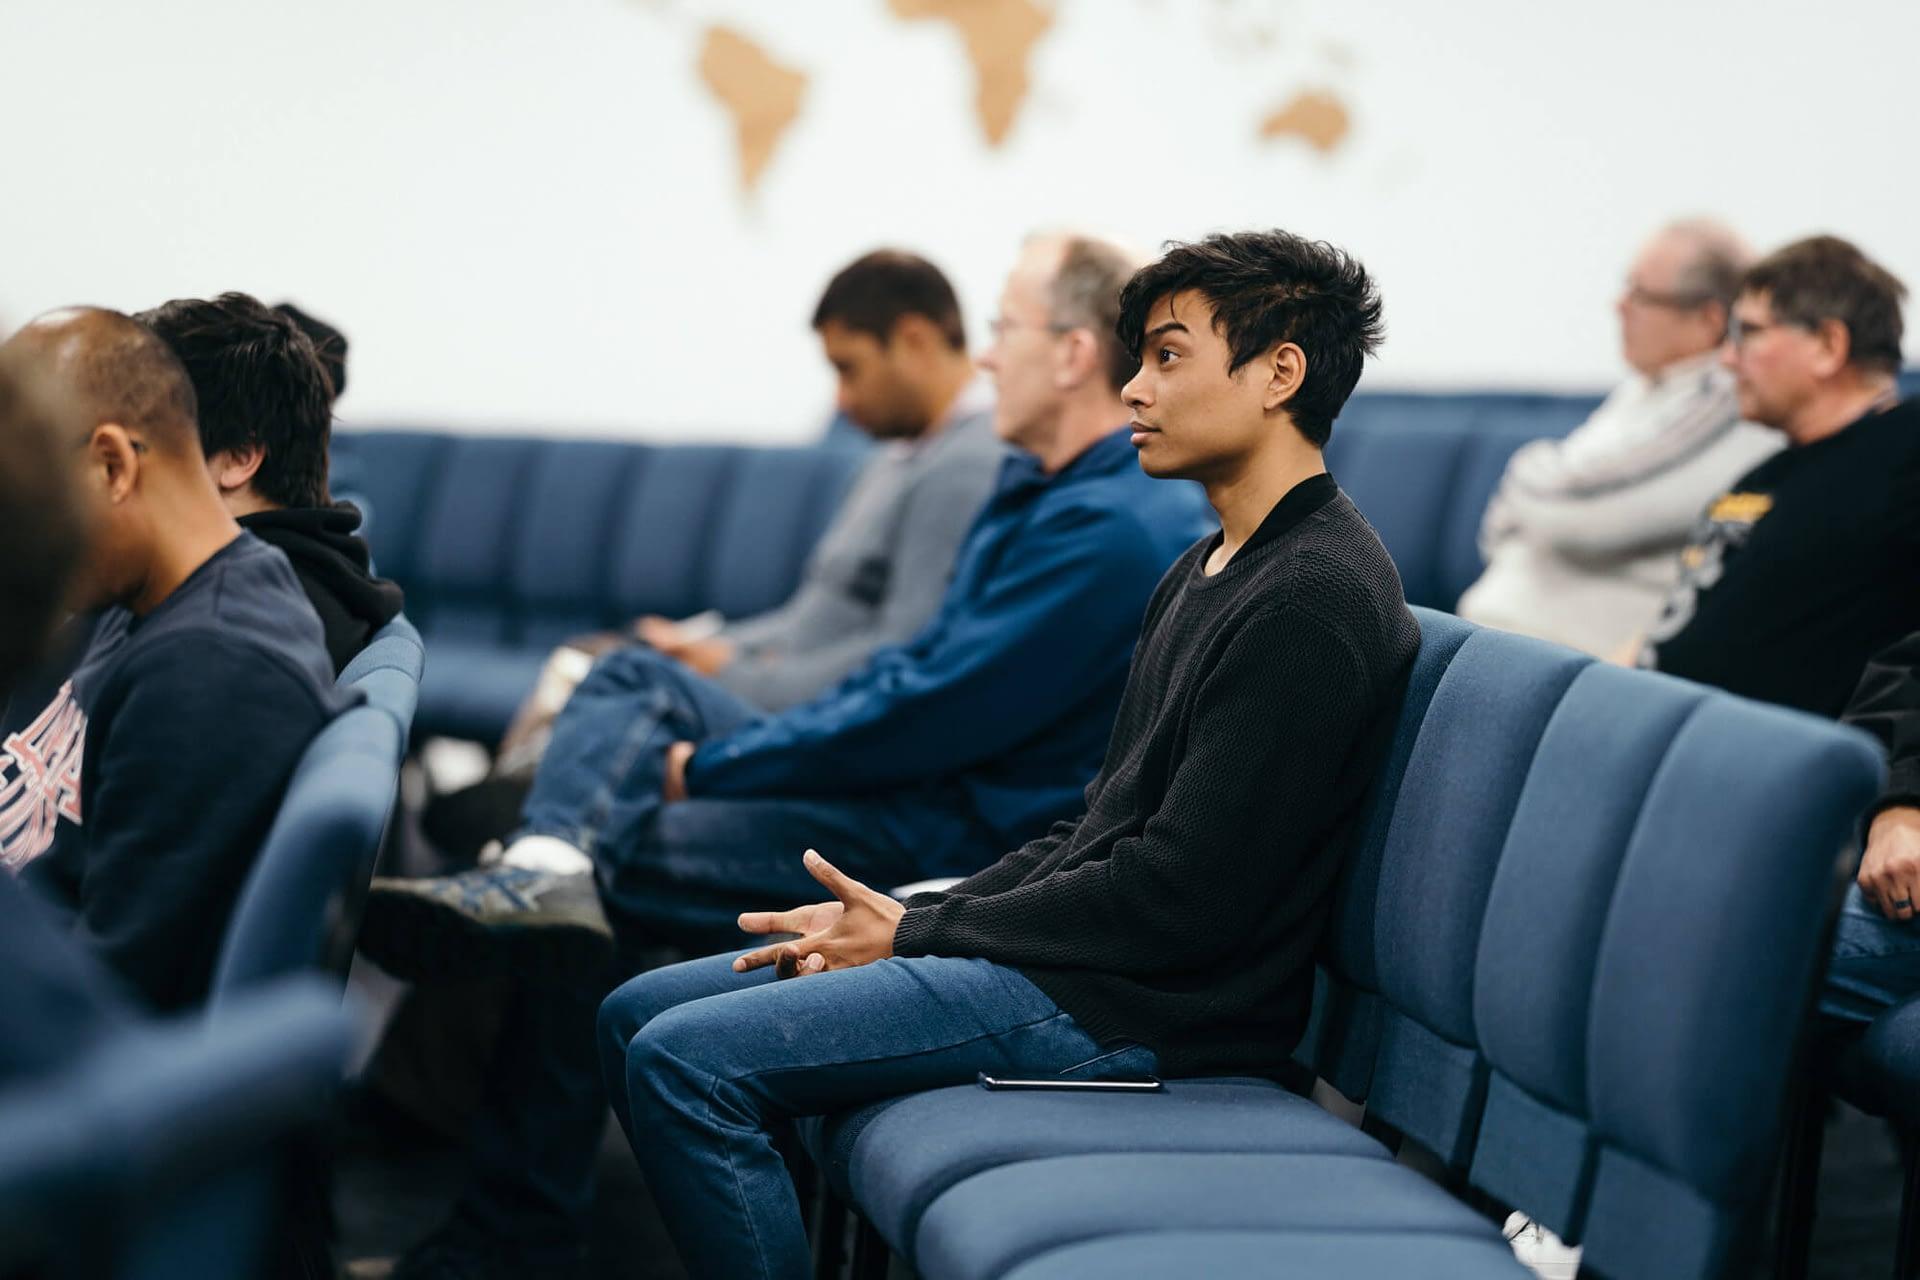 basecamp-2020-livestream-fellowship-baptist-church-gathering-3.jpg